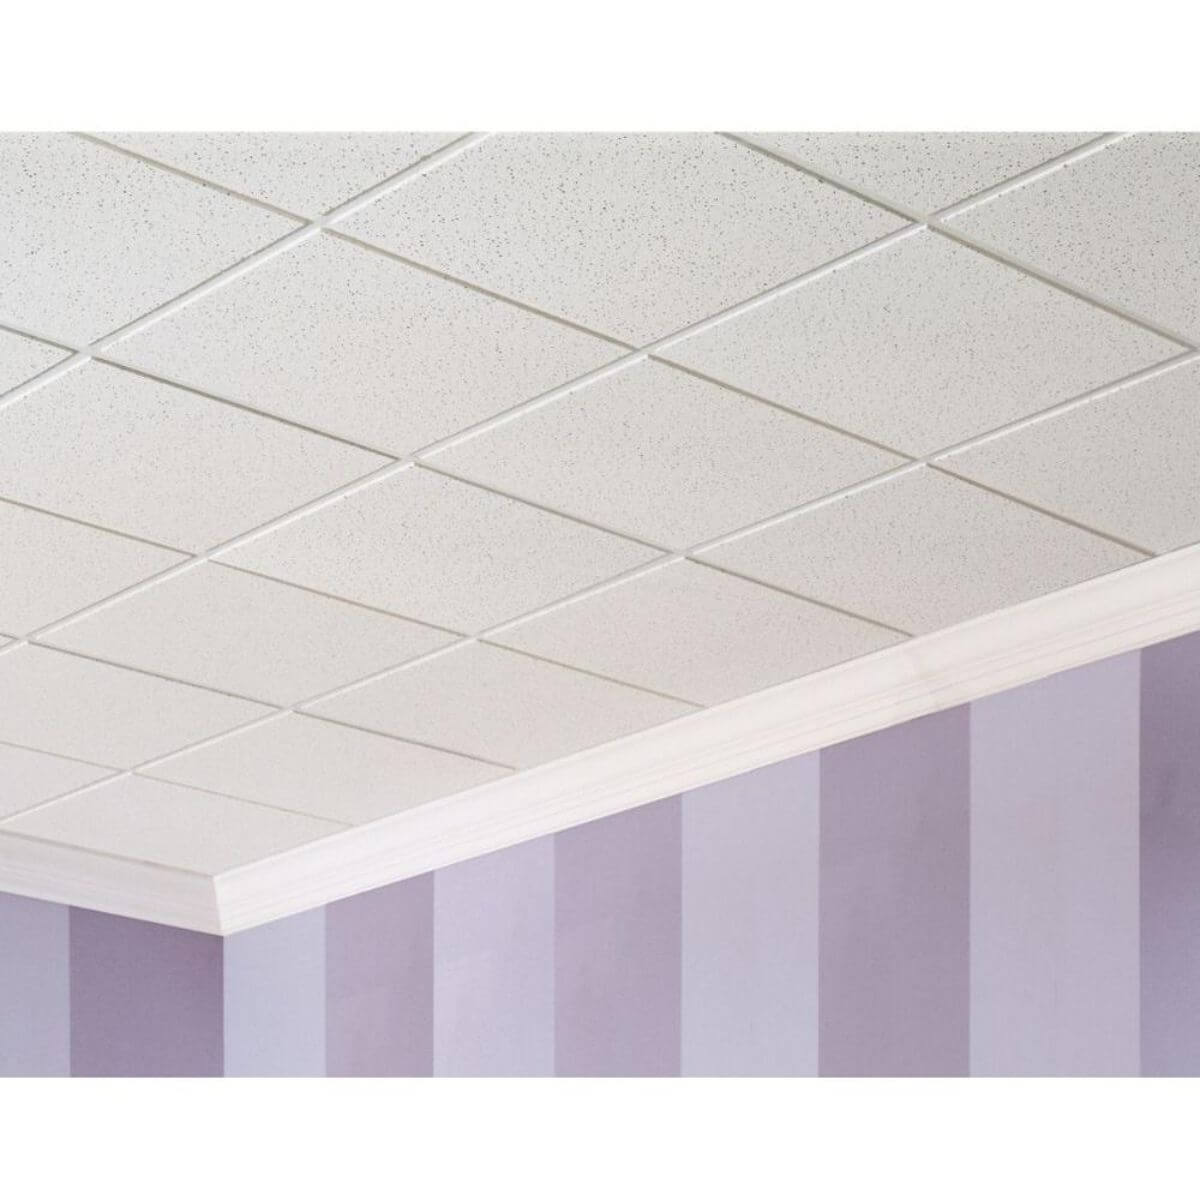 Acoustical Ceiling Tiles Livermore Ca 2a